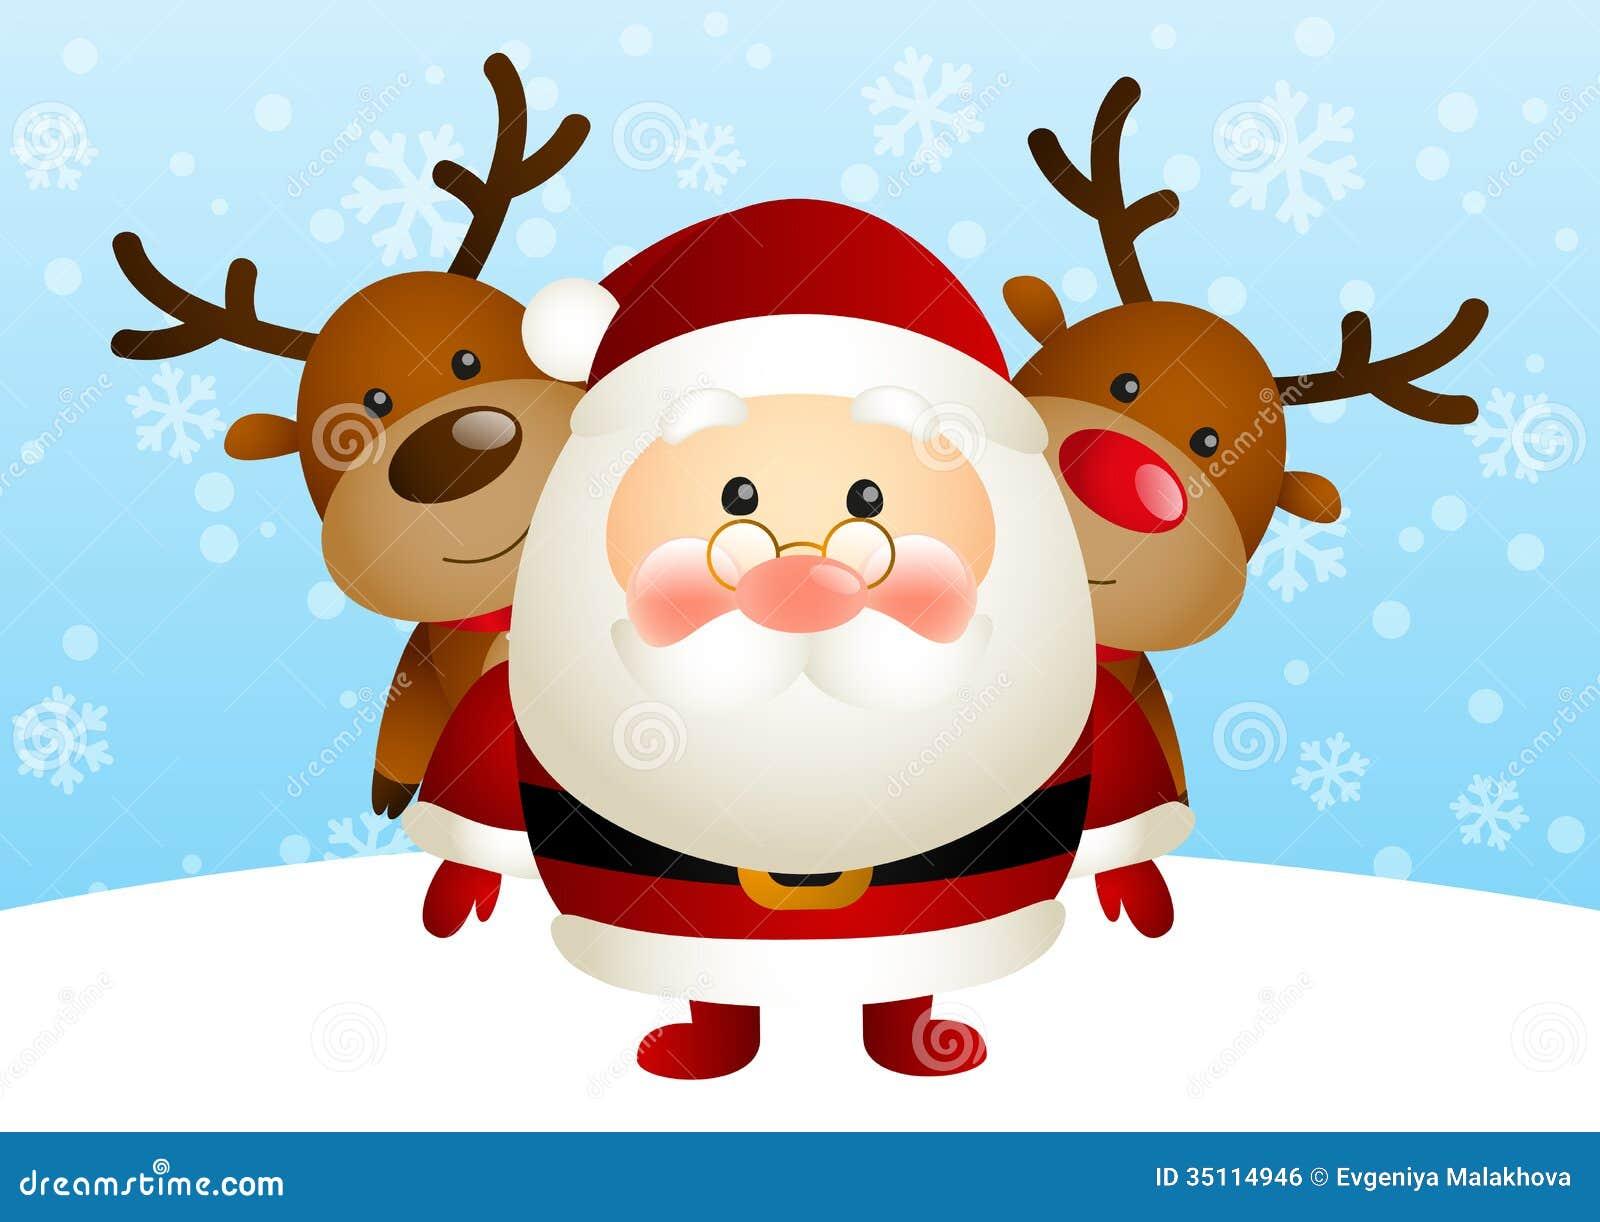 Cute Santa With Deers Royalty Free Stock Image Image 35114946